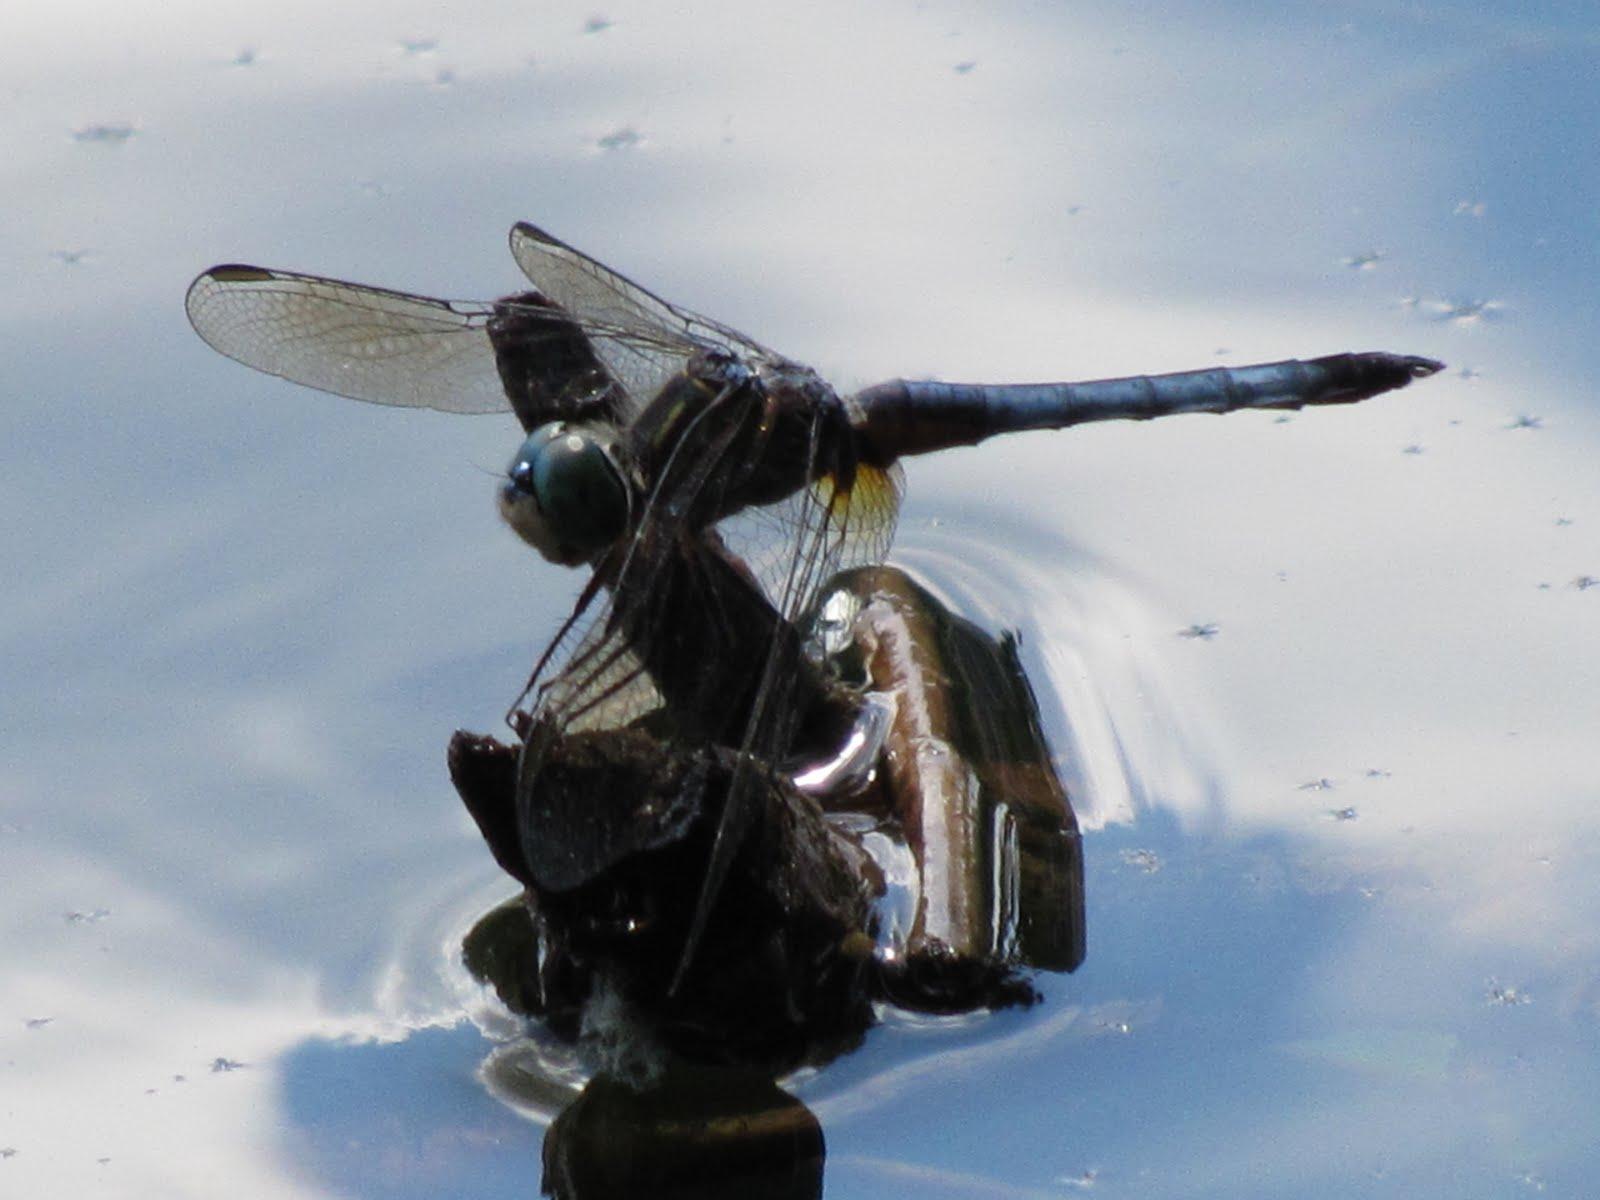 Celestial Ramblings: hic sunt dracones (HERE BE DRAGONS!)